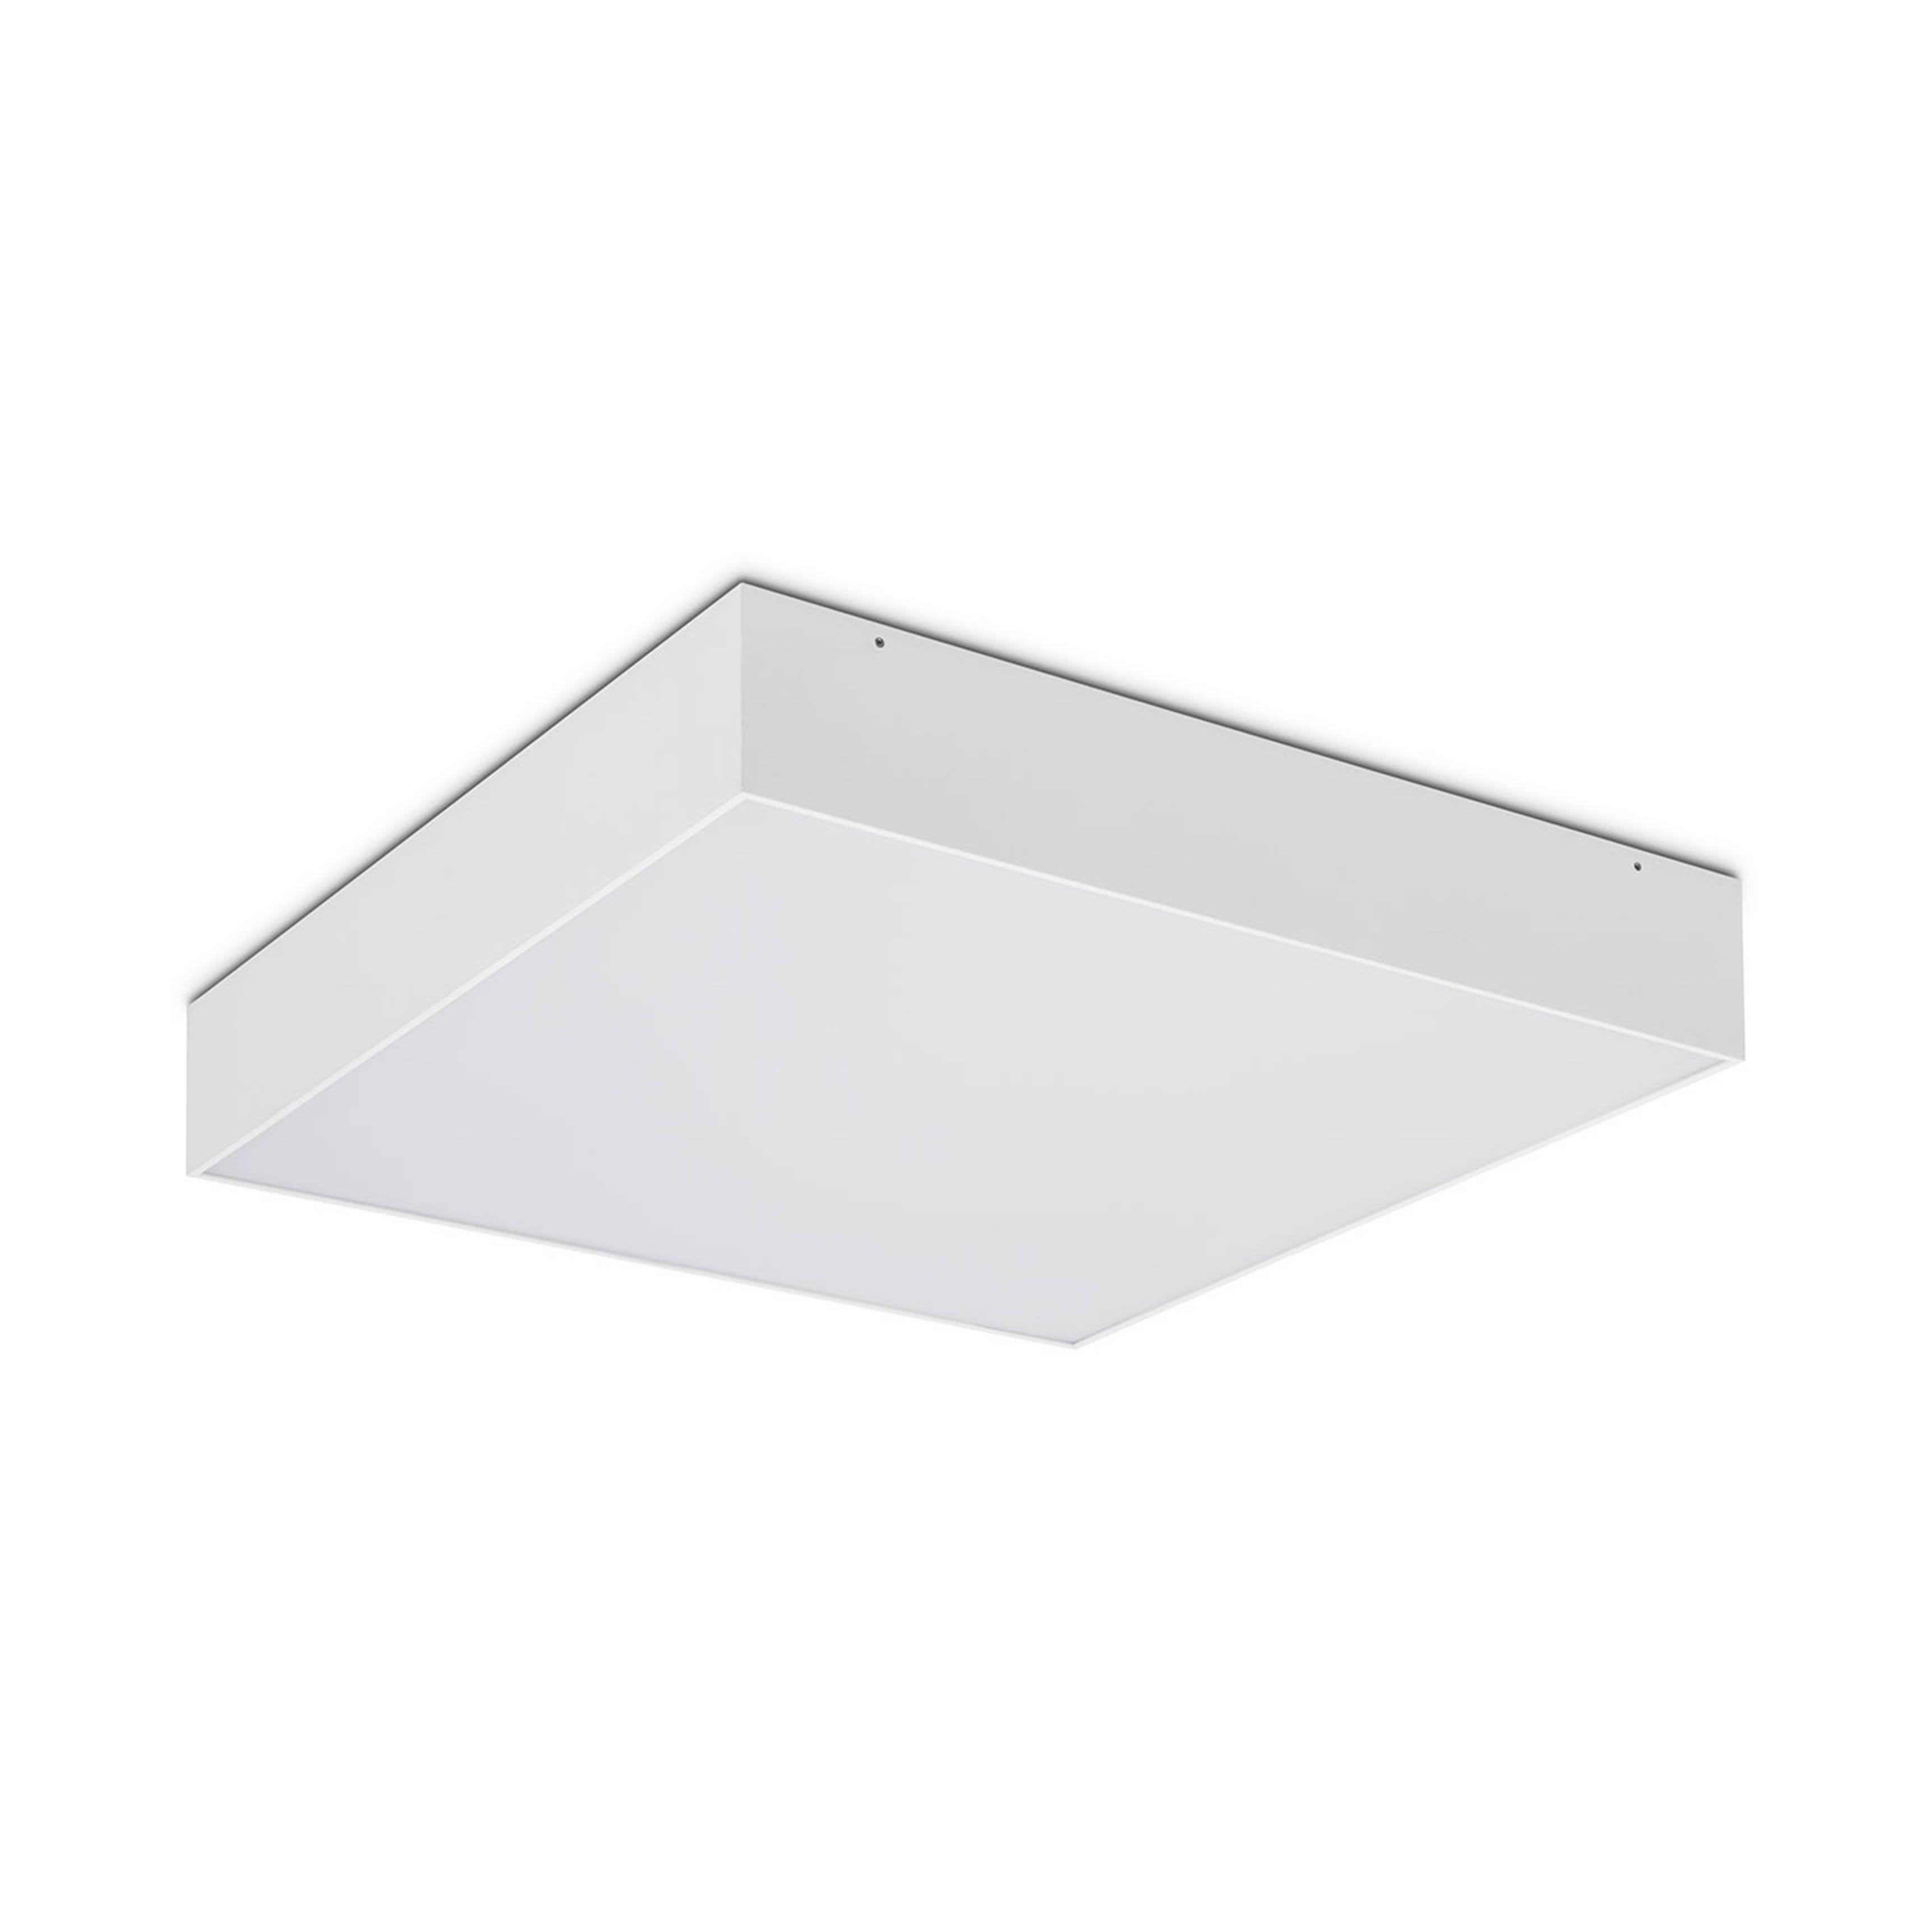 diy lighting by photography light homemade box photo step tutorial lightbox